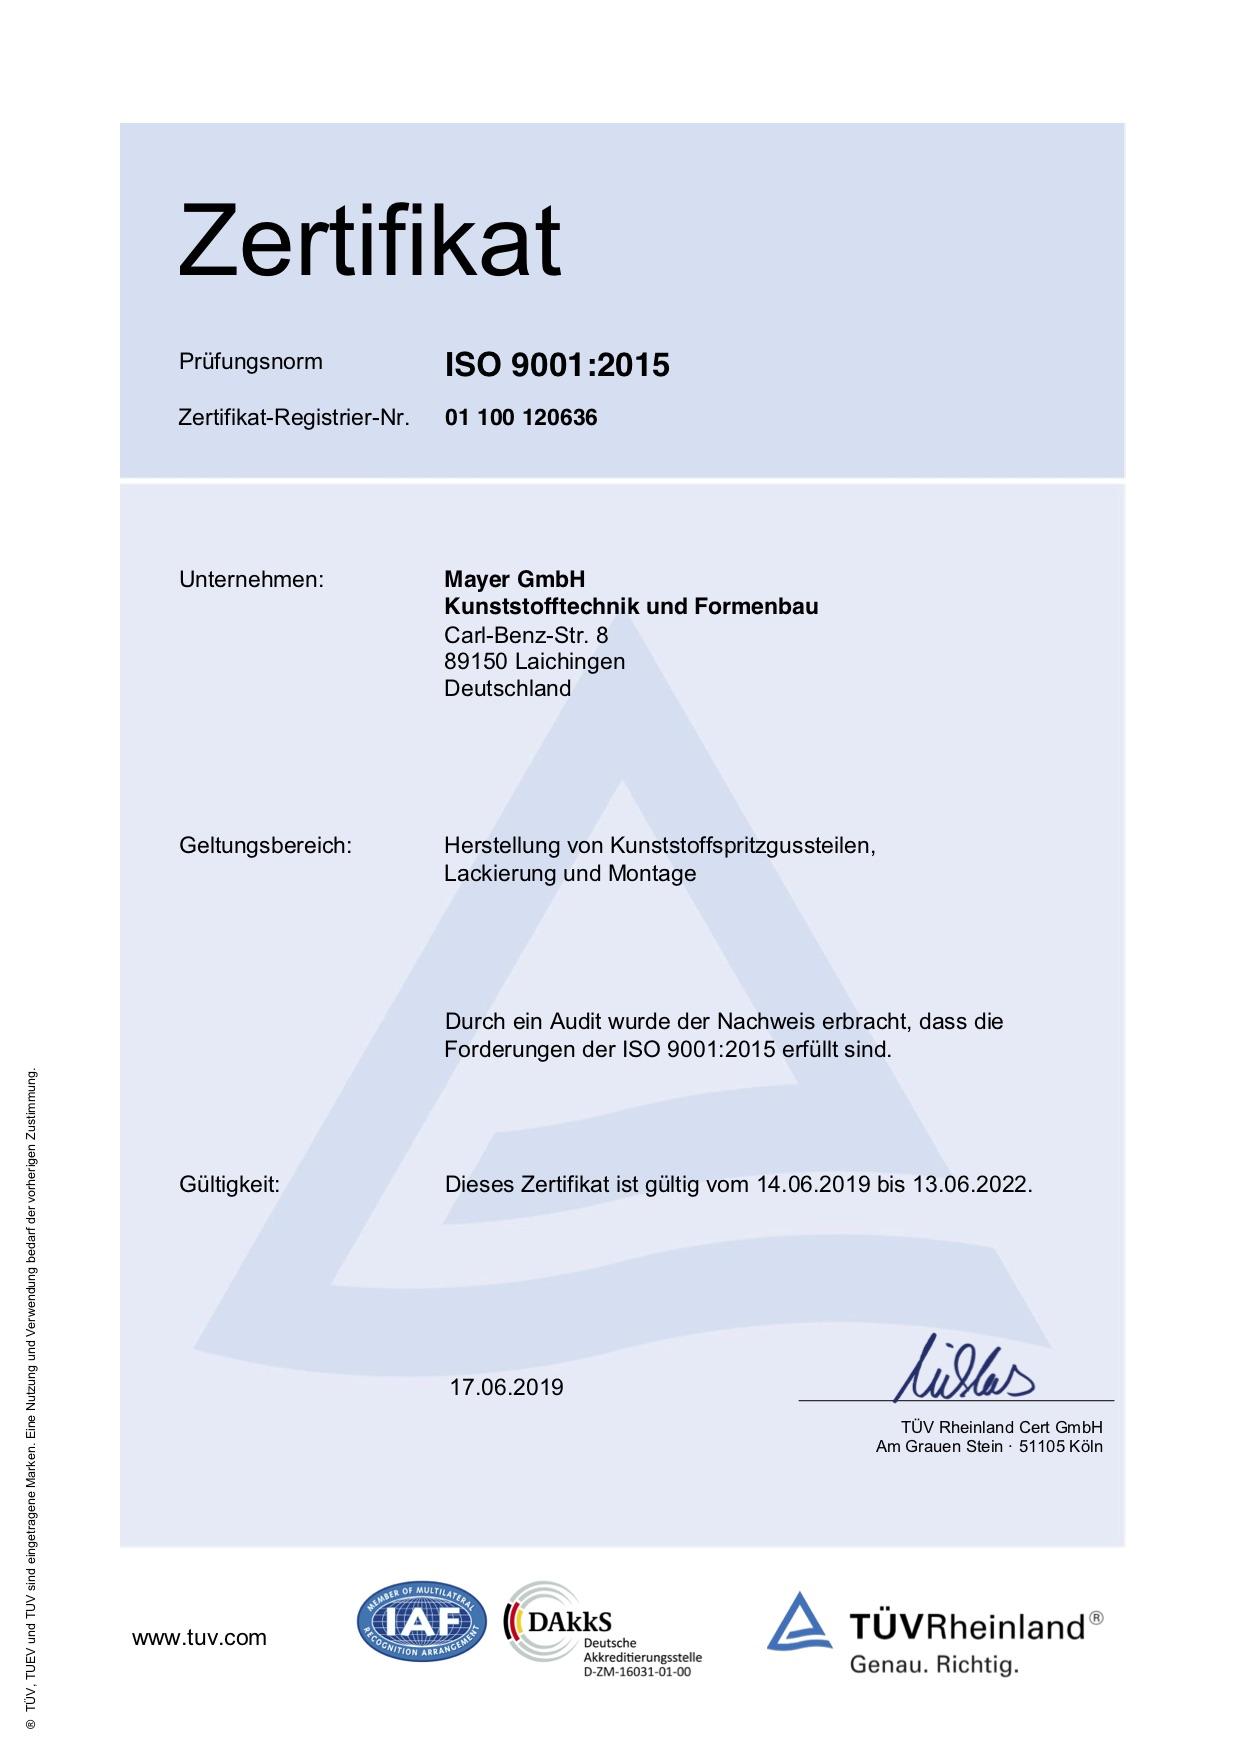 Mayer GmbH, Laichingen –Zertifikat ISO 9001, 2015